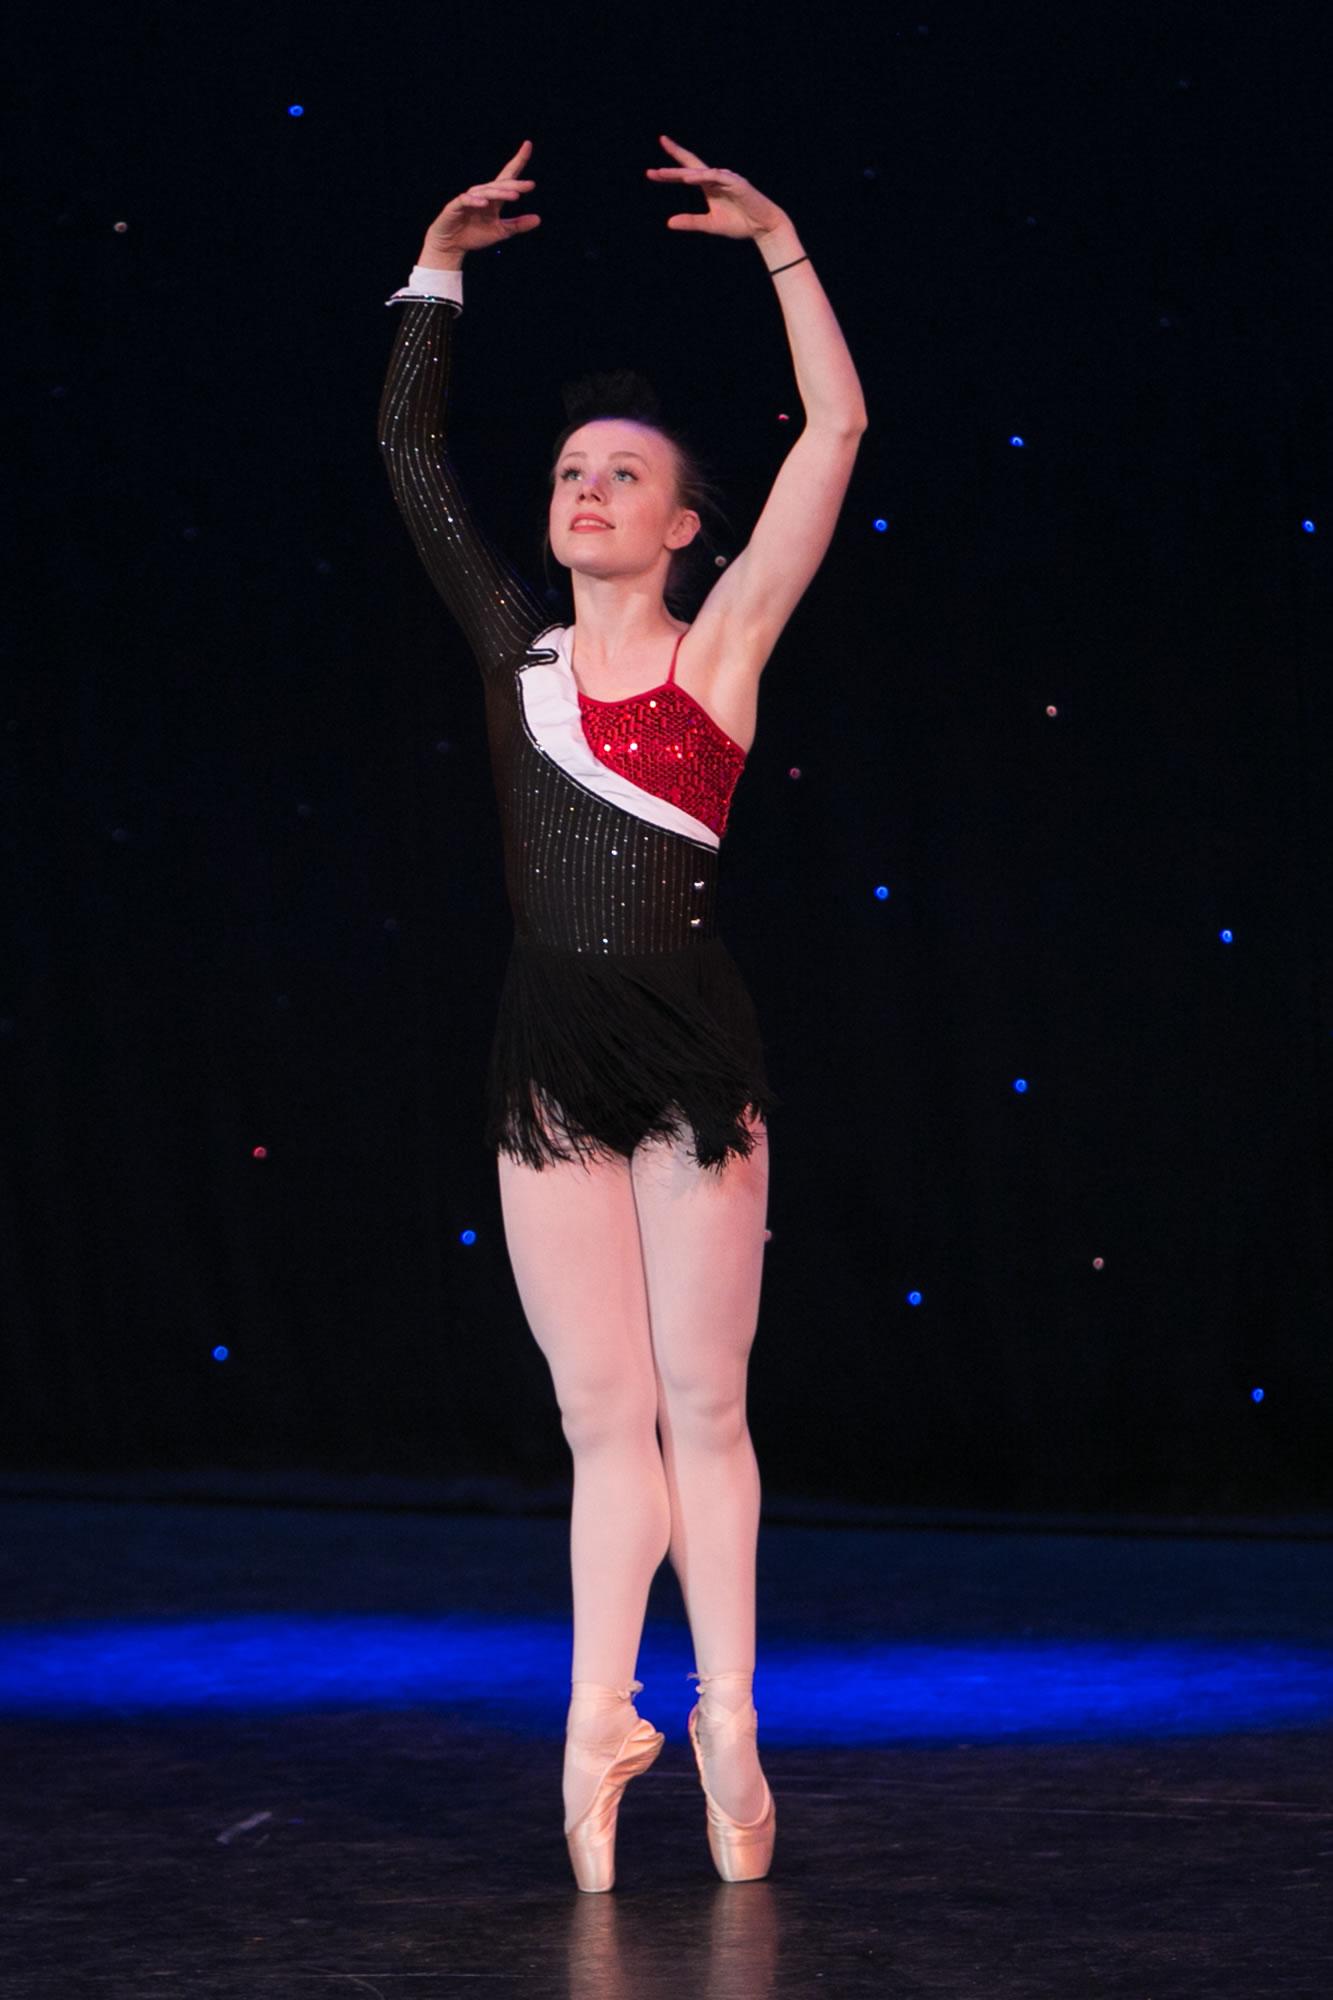 Hitchin_School_of_Dance_Show_2019-SM1_3212.jpg